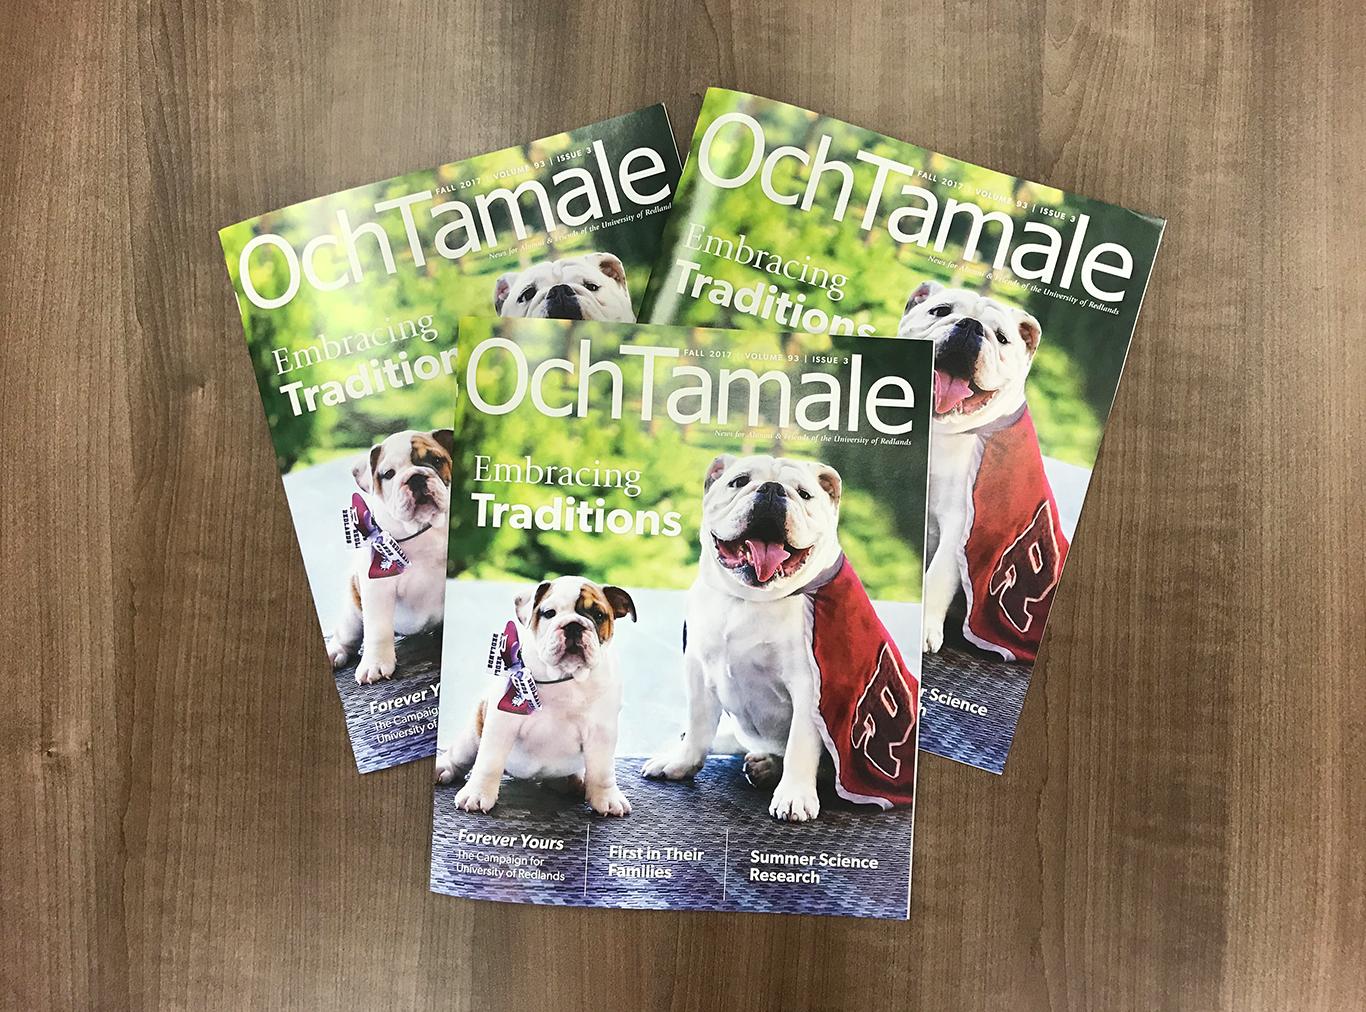 Och Tamale magazine, Fall 2017 edition